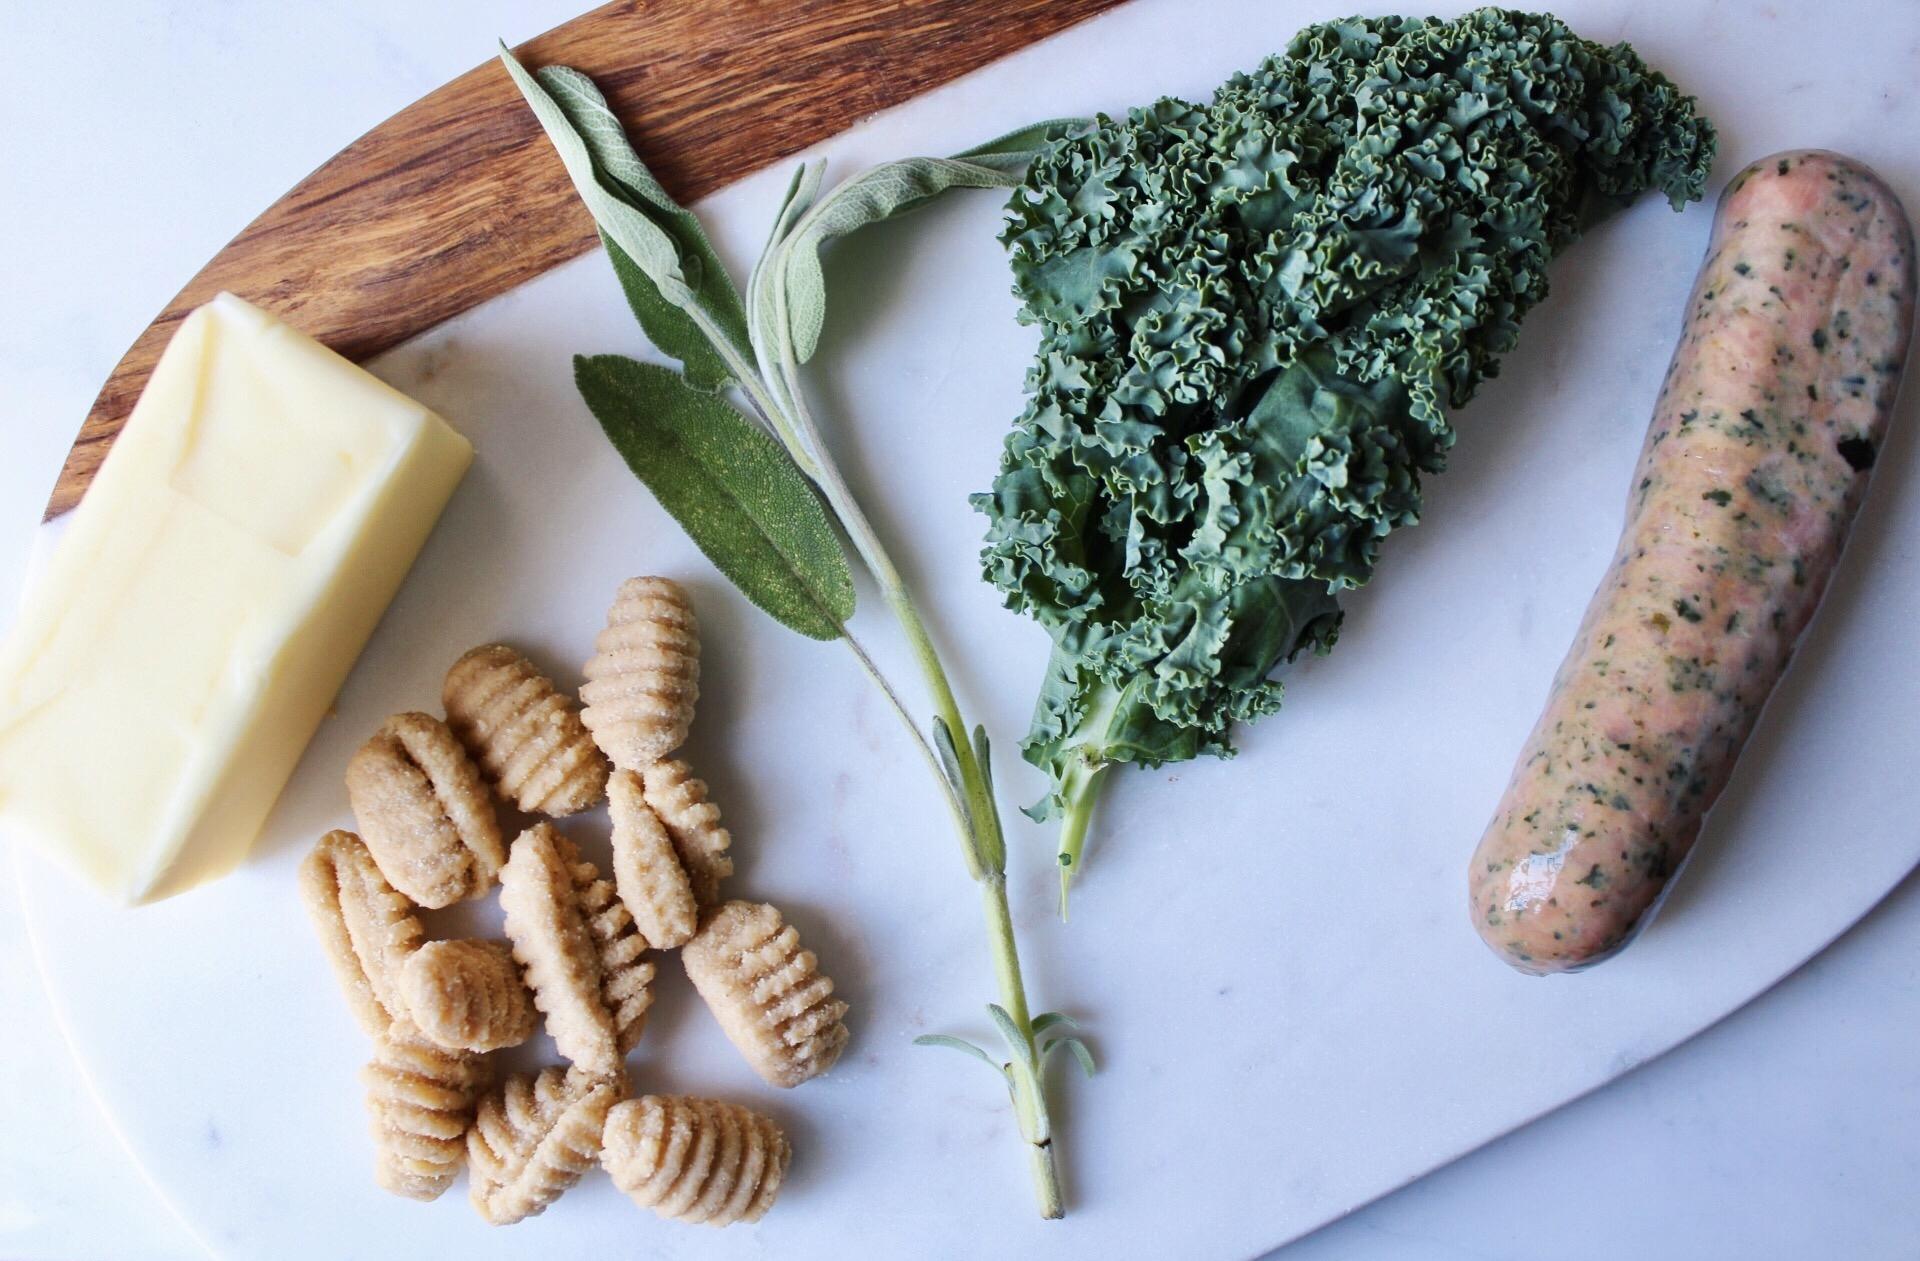 ingredients for sweet potato gnocchi, sausage, and kale